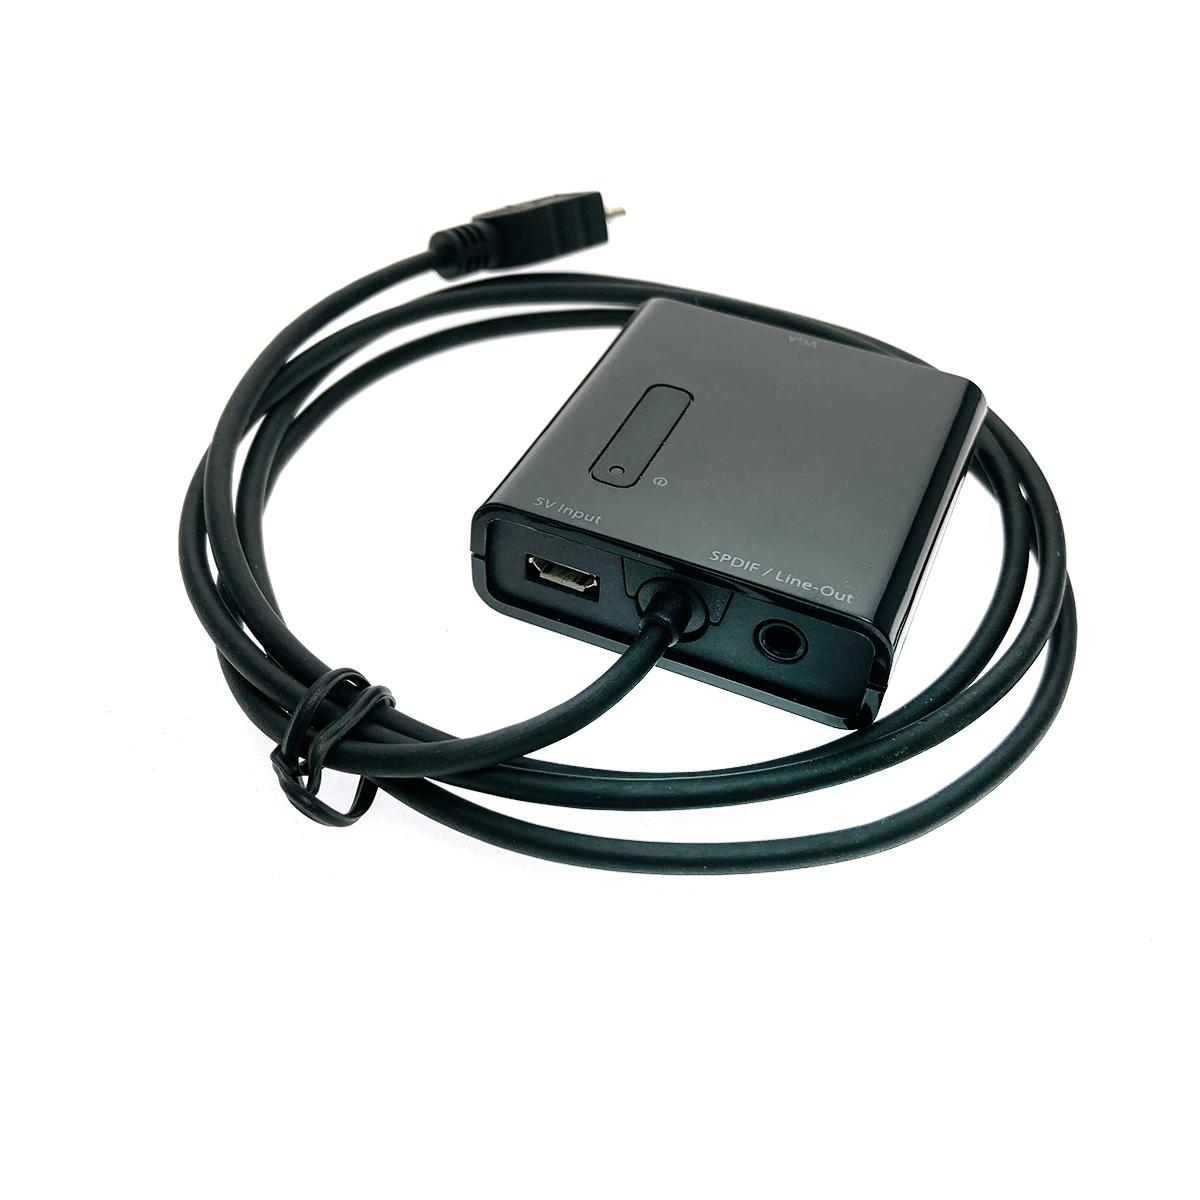 HL-кабель Micro USB B male to VGA female with Analog/Digital Audio (SPDIF)